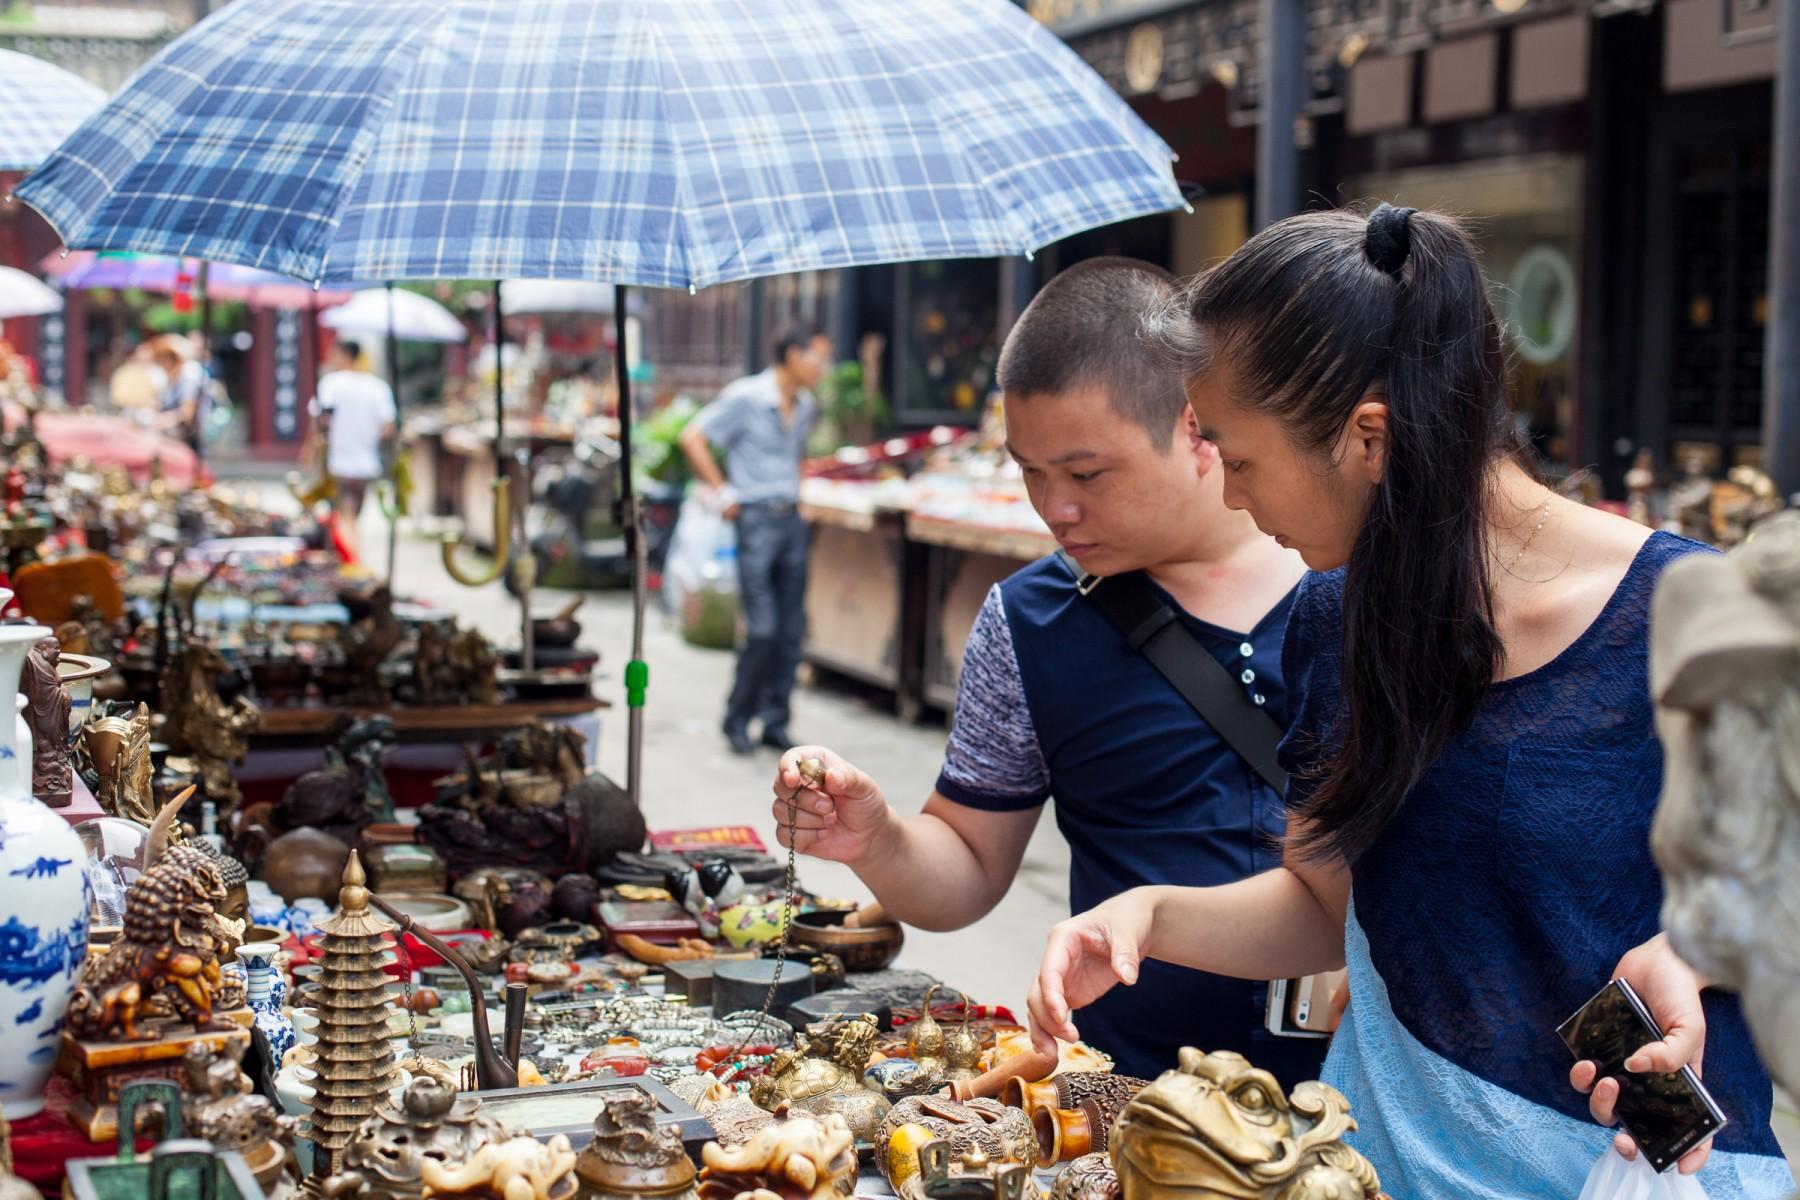 Market stall Chengdu, Sichuan province, China.